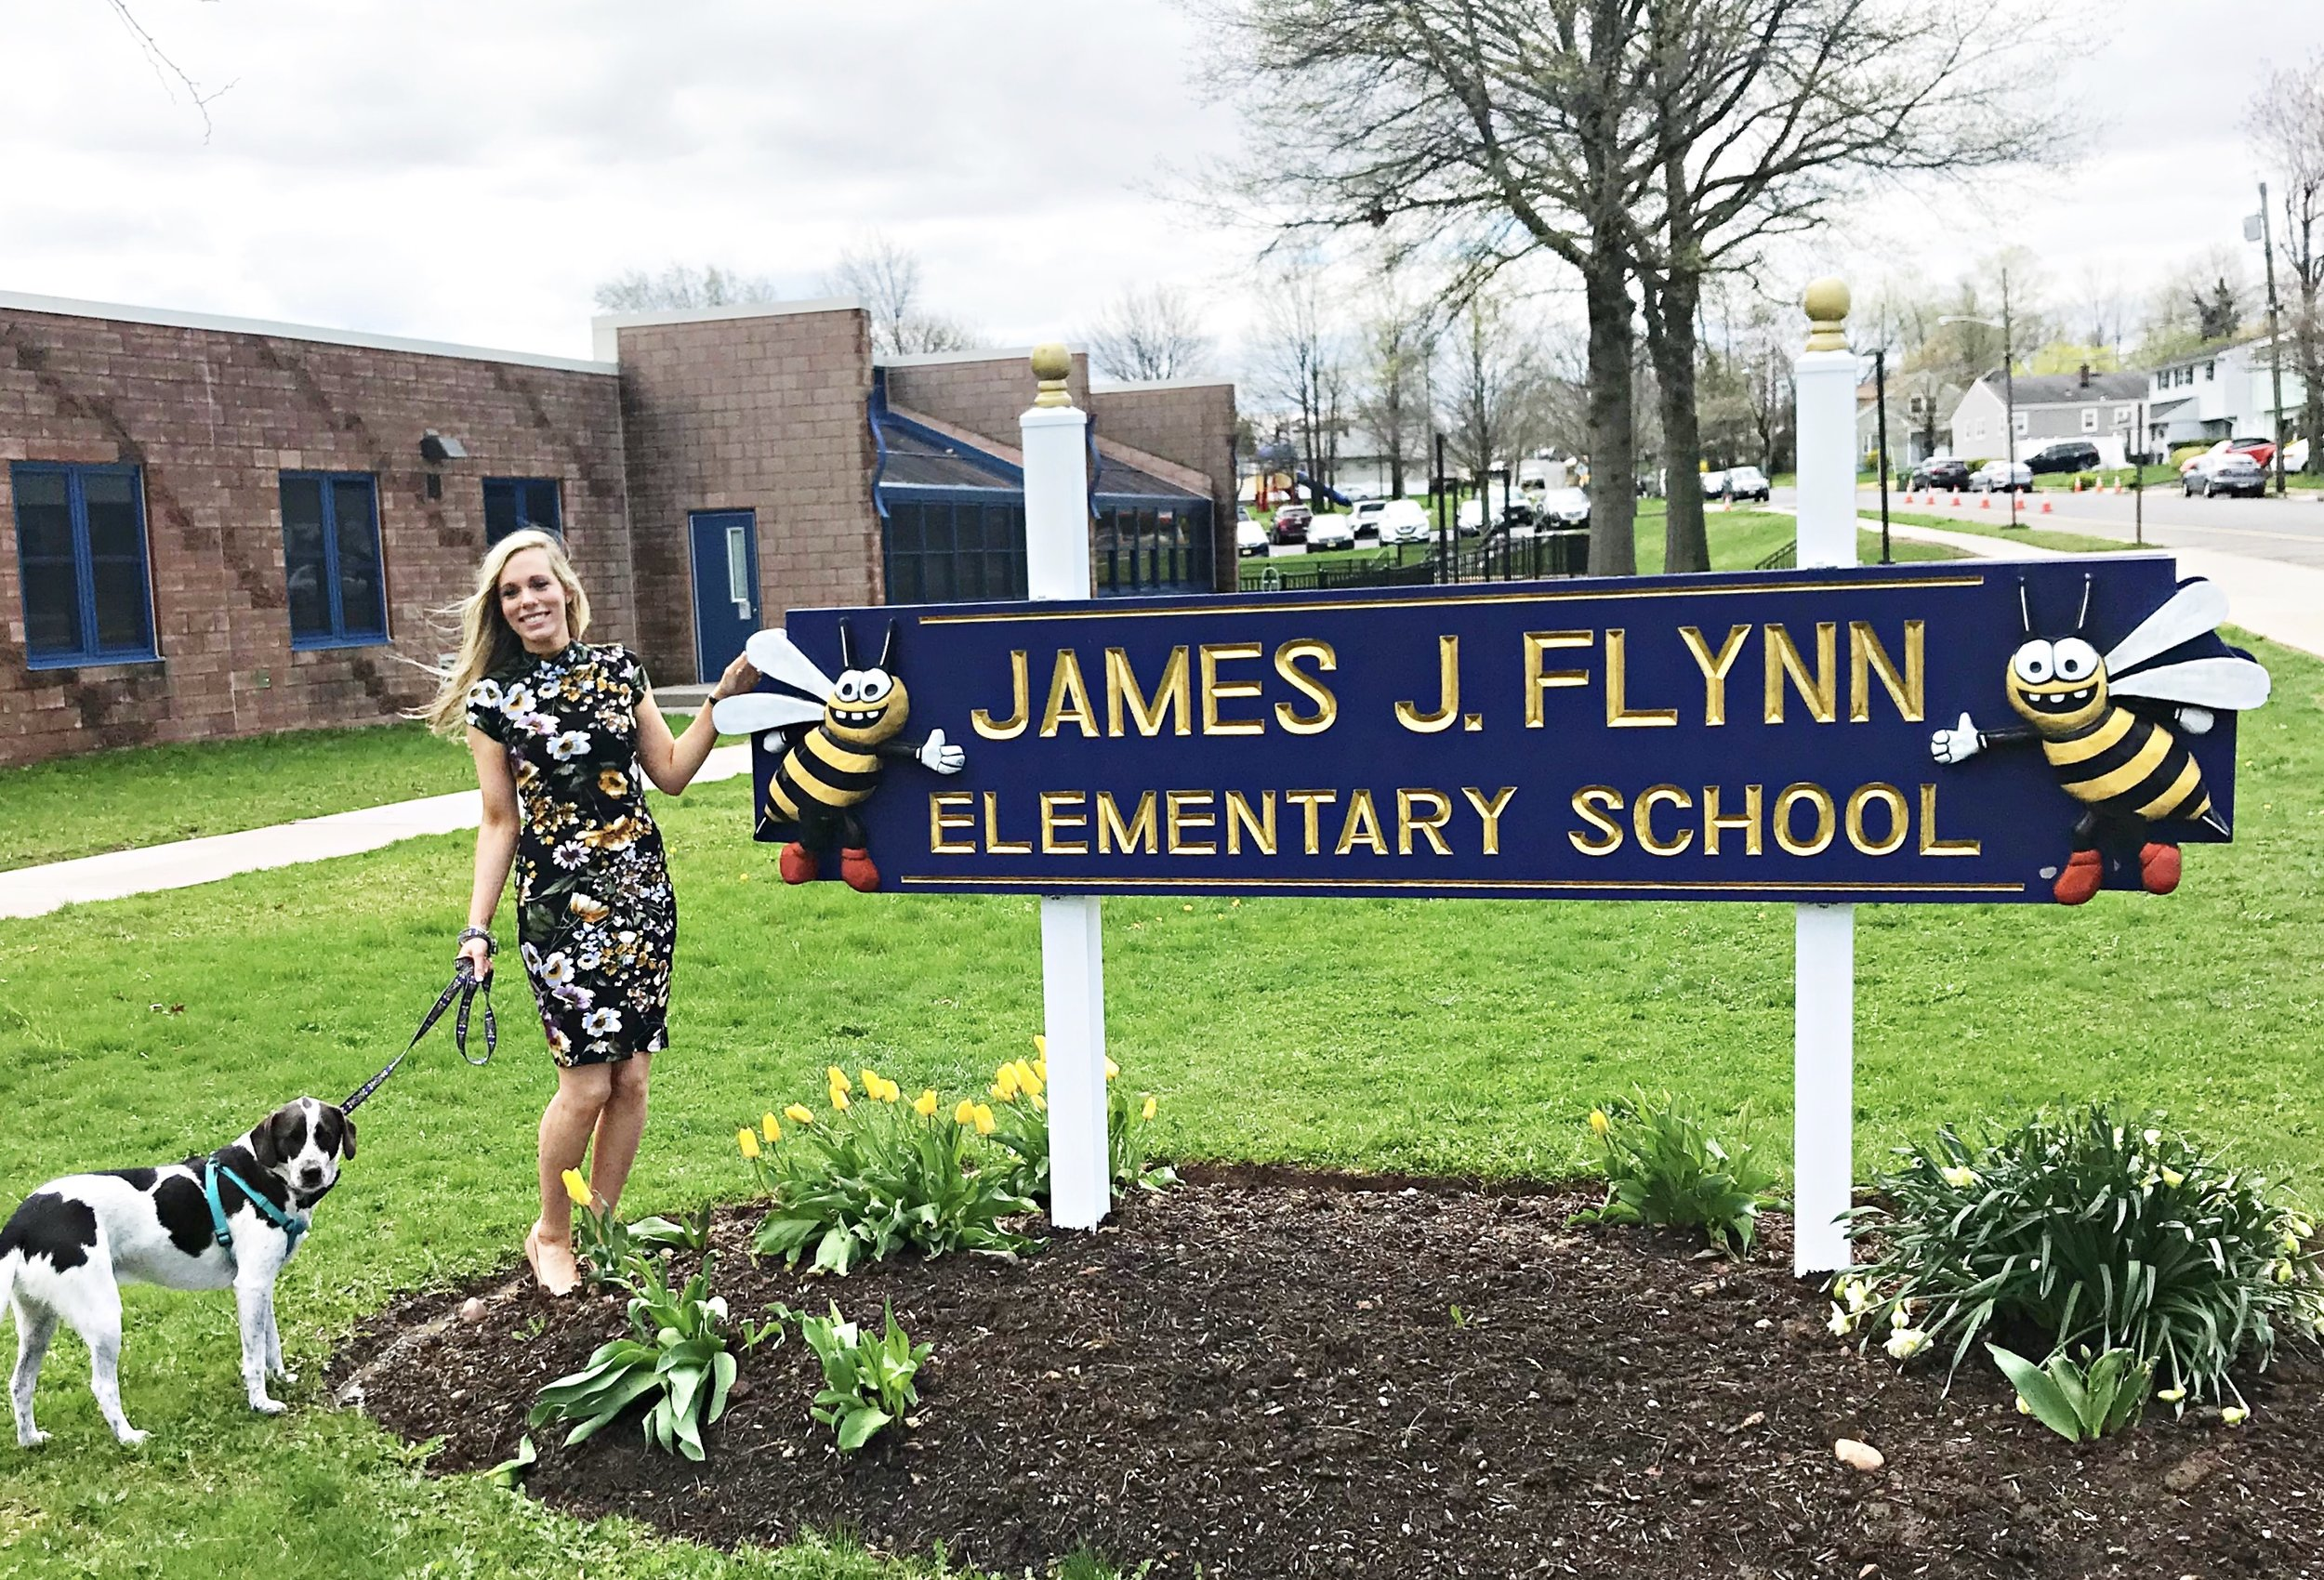 James J. Flynn Elementary